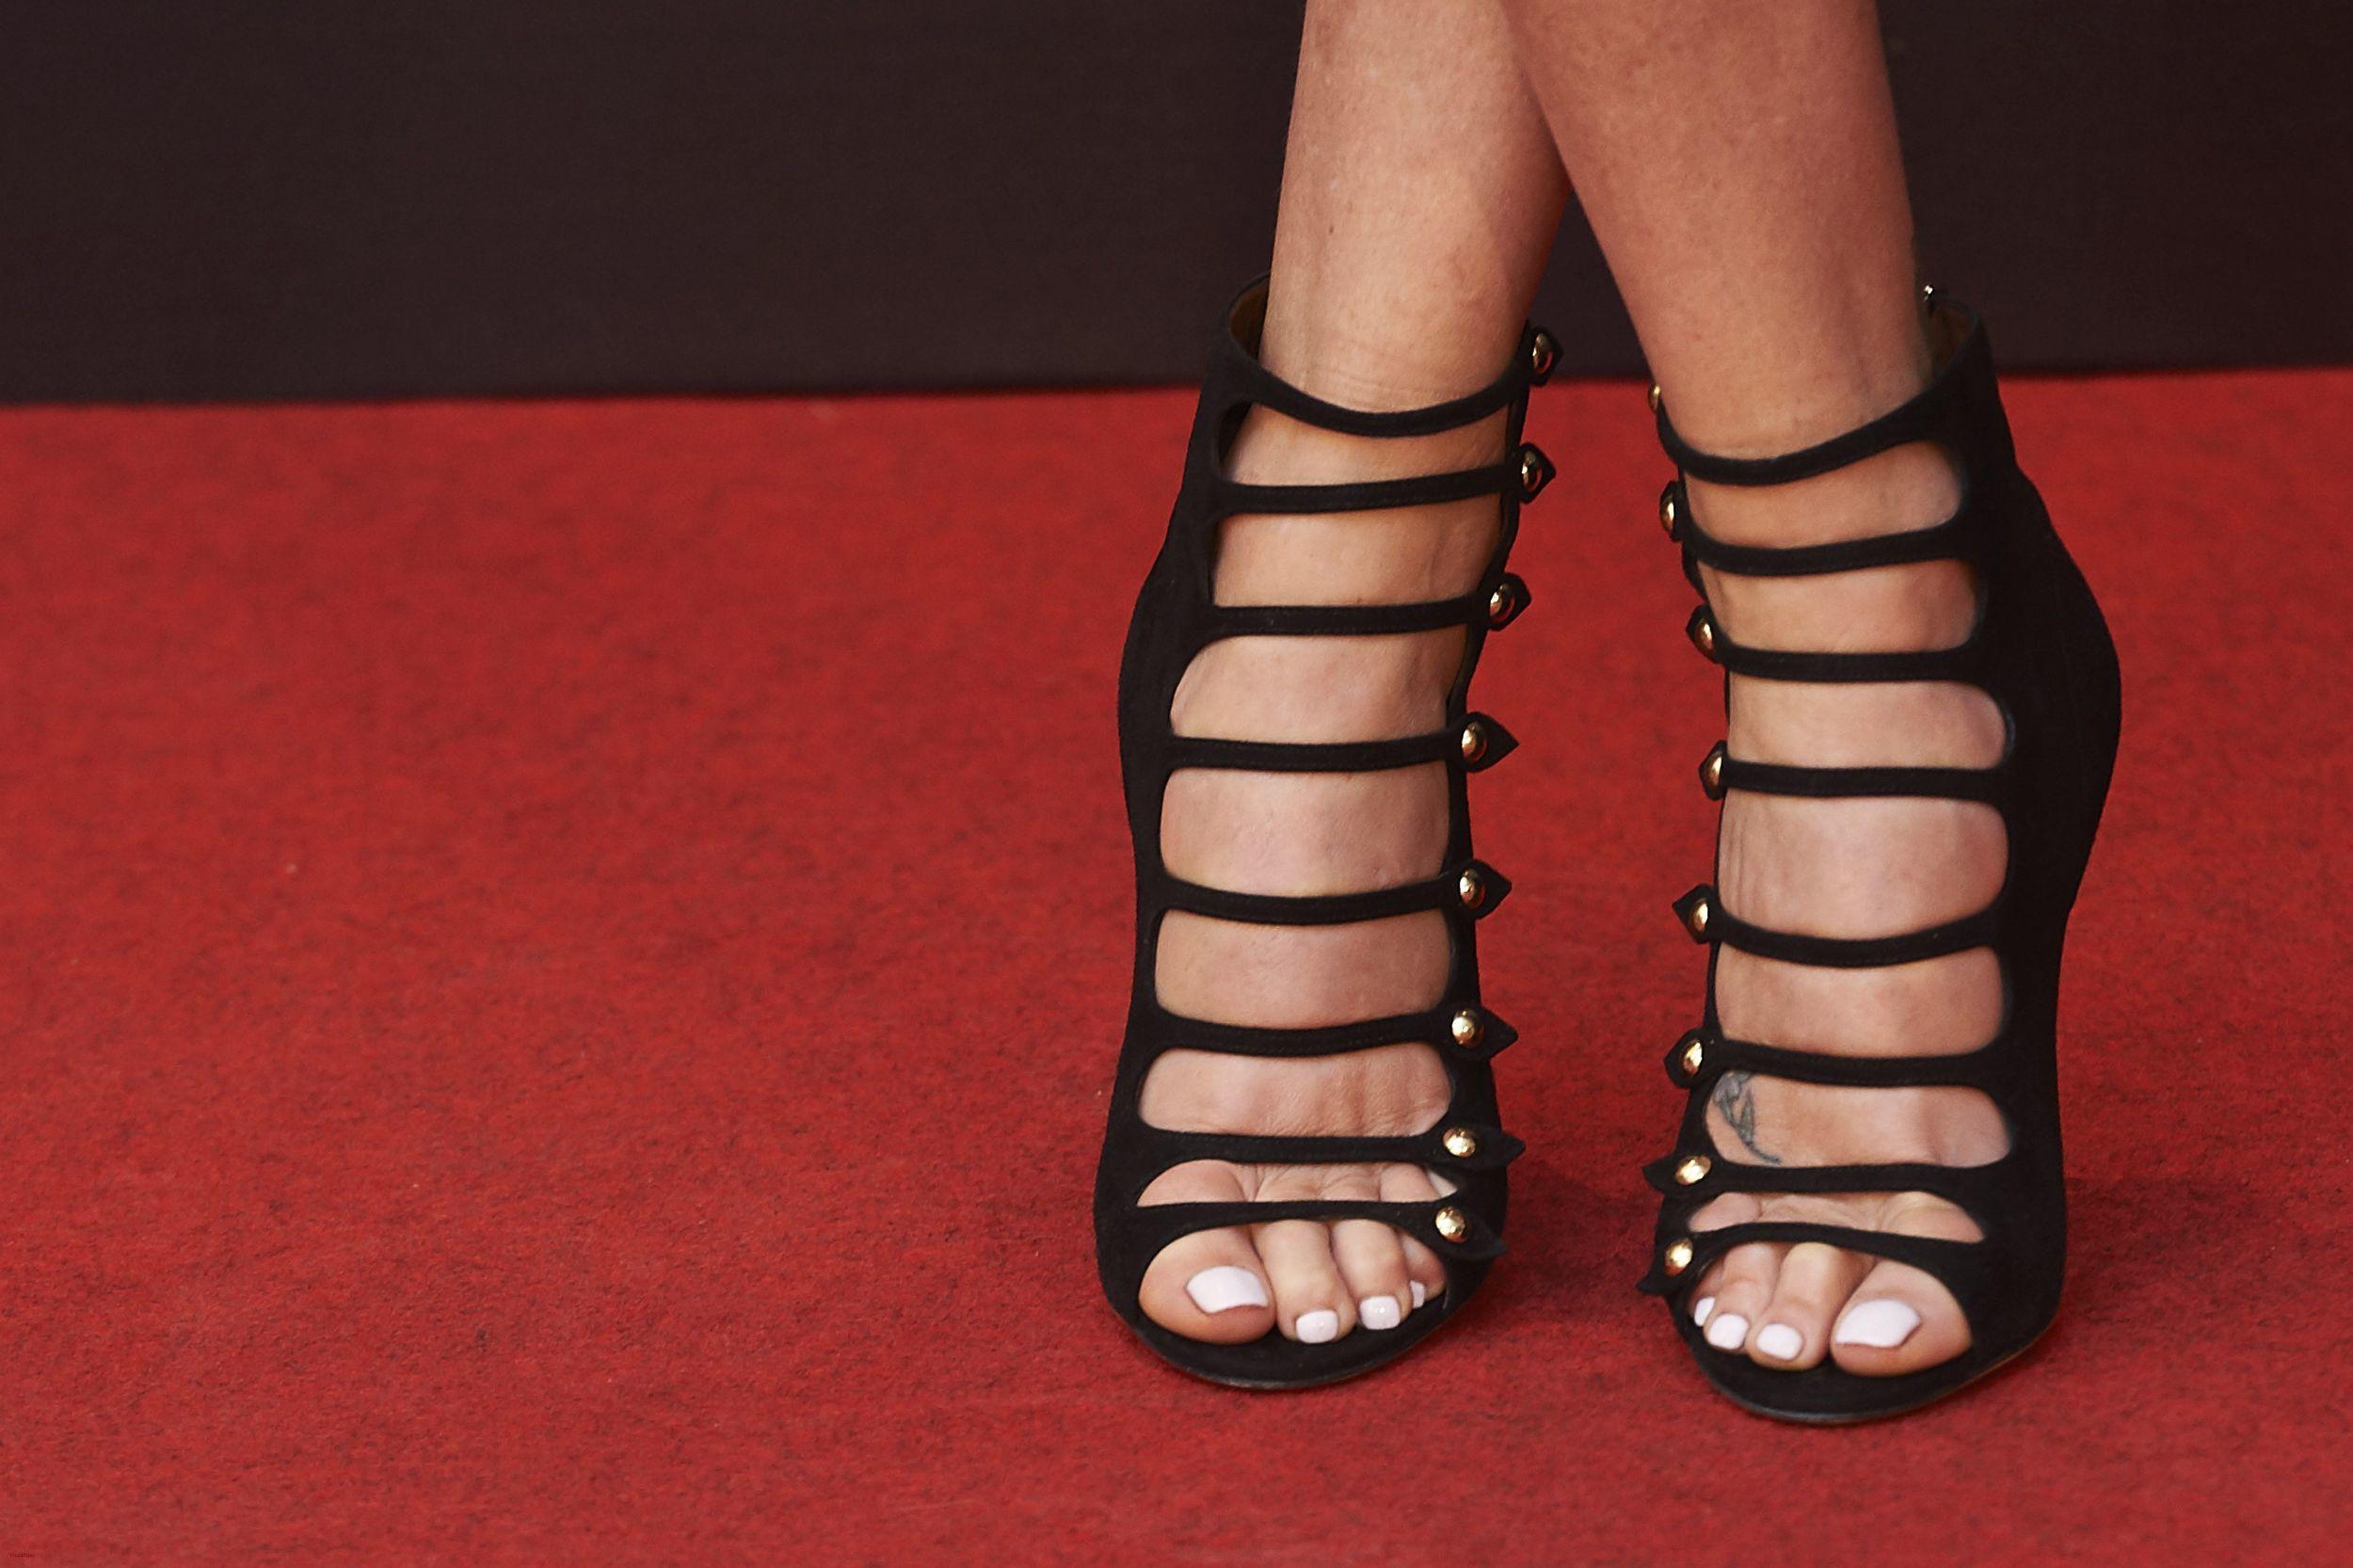 Feet Charlize Theron nude photos 2019